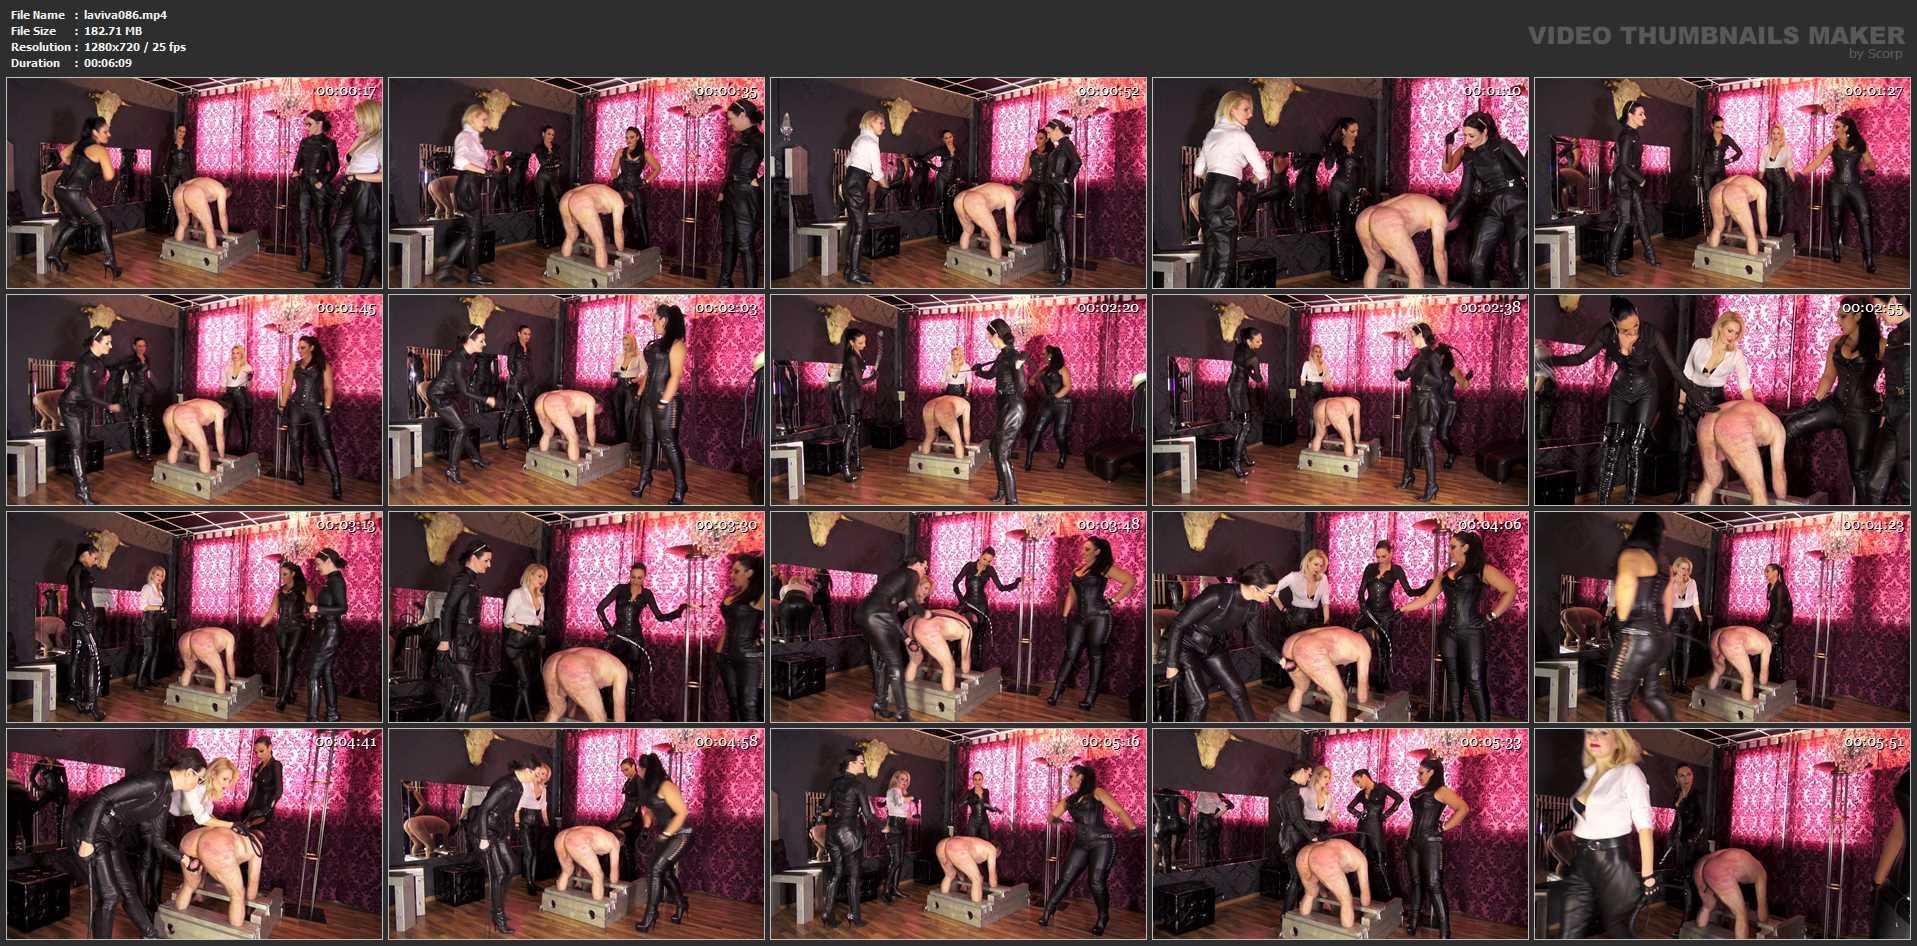 Lady Victoria Valente In Scene: 4 Mistresses, 4 whips Part 2 - CLIPS4SALE / LADYVICTORIAVALENTE - HD/720p/MP4